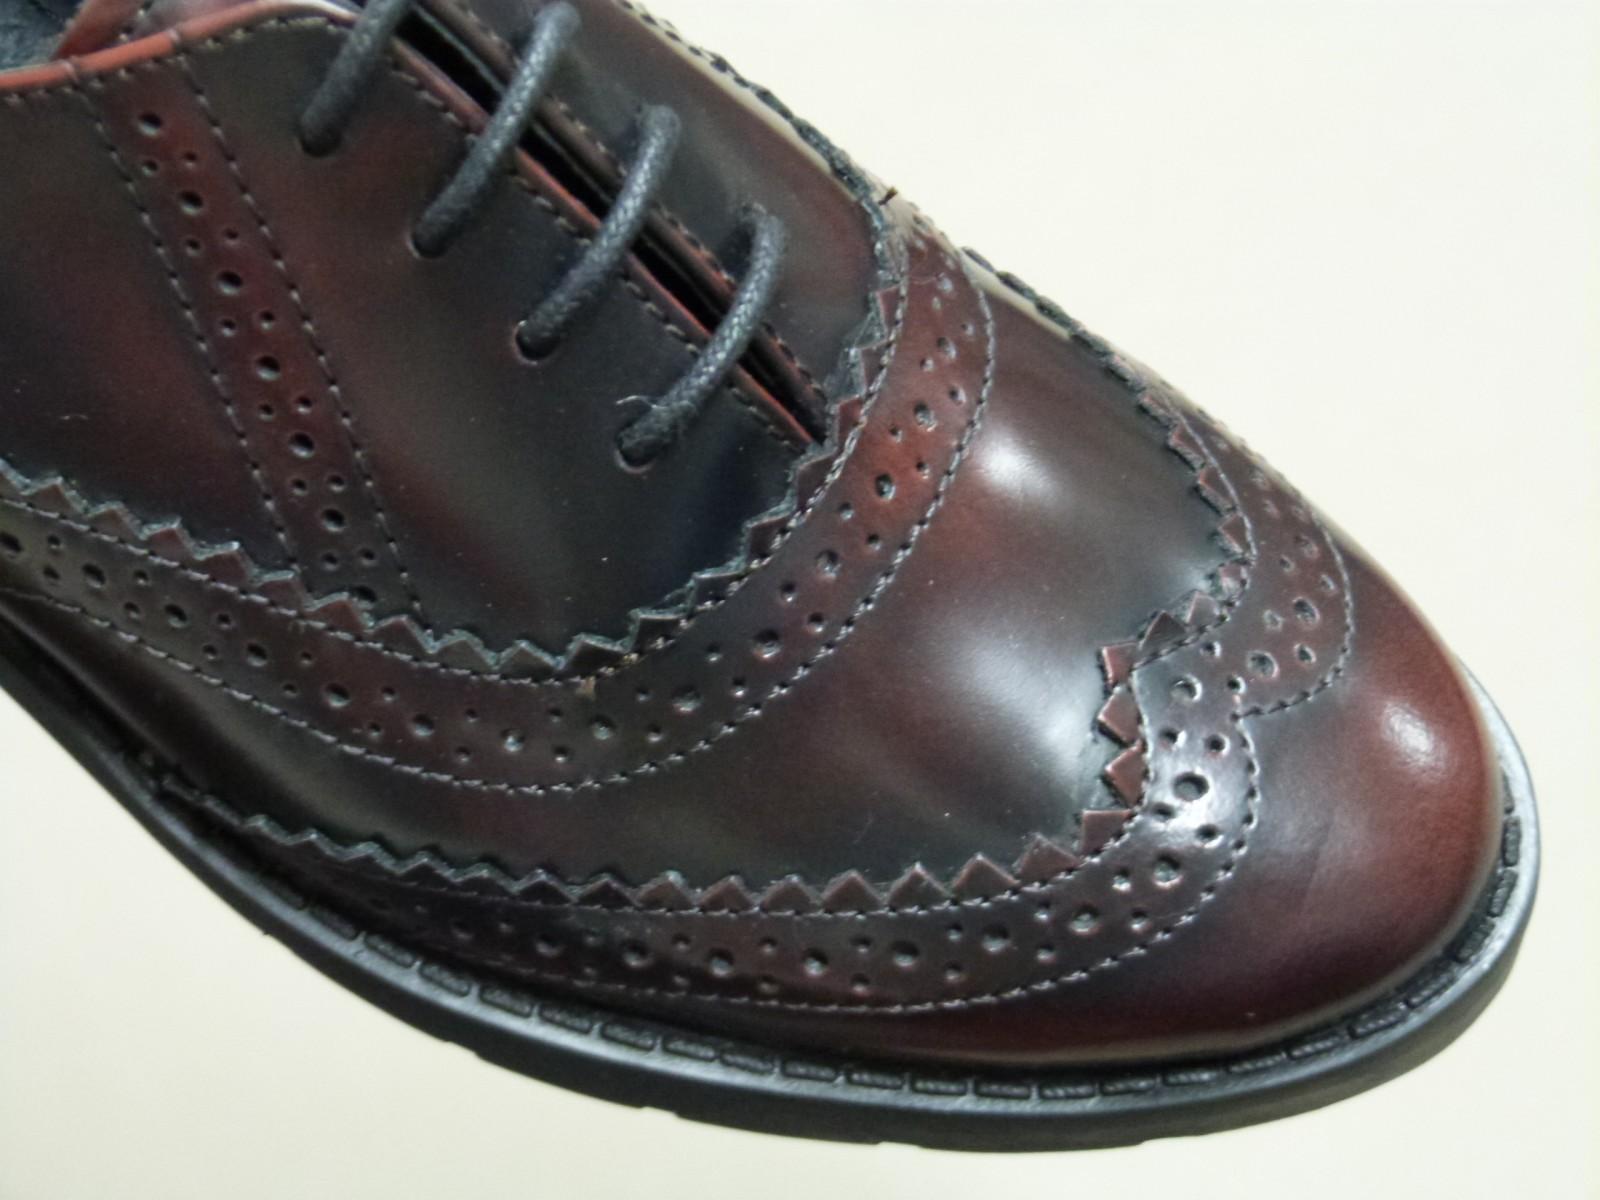 calzado infantil y juvenil, zapatos oxford niñas